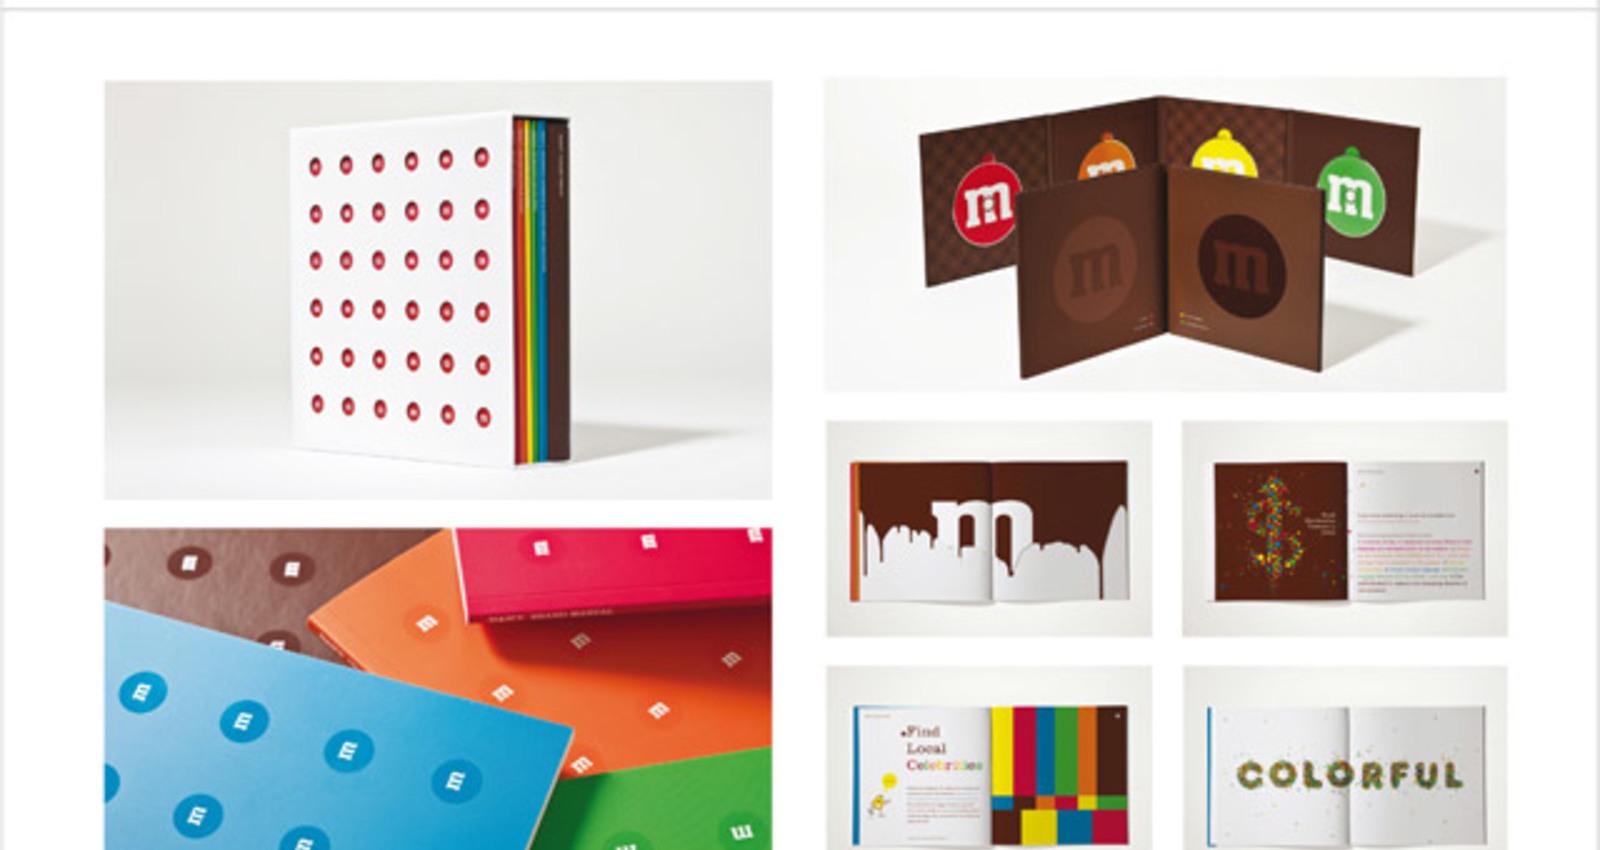 M&M's Global Brand Book